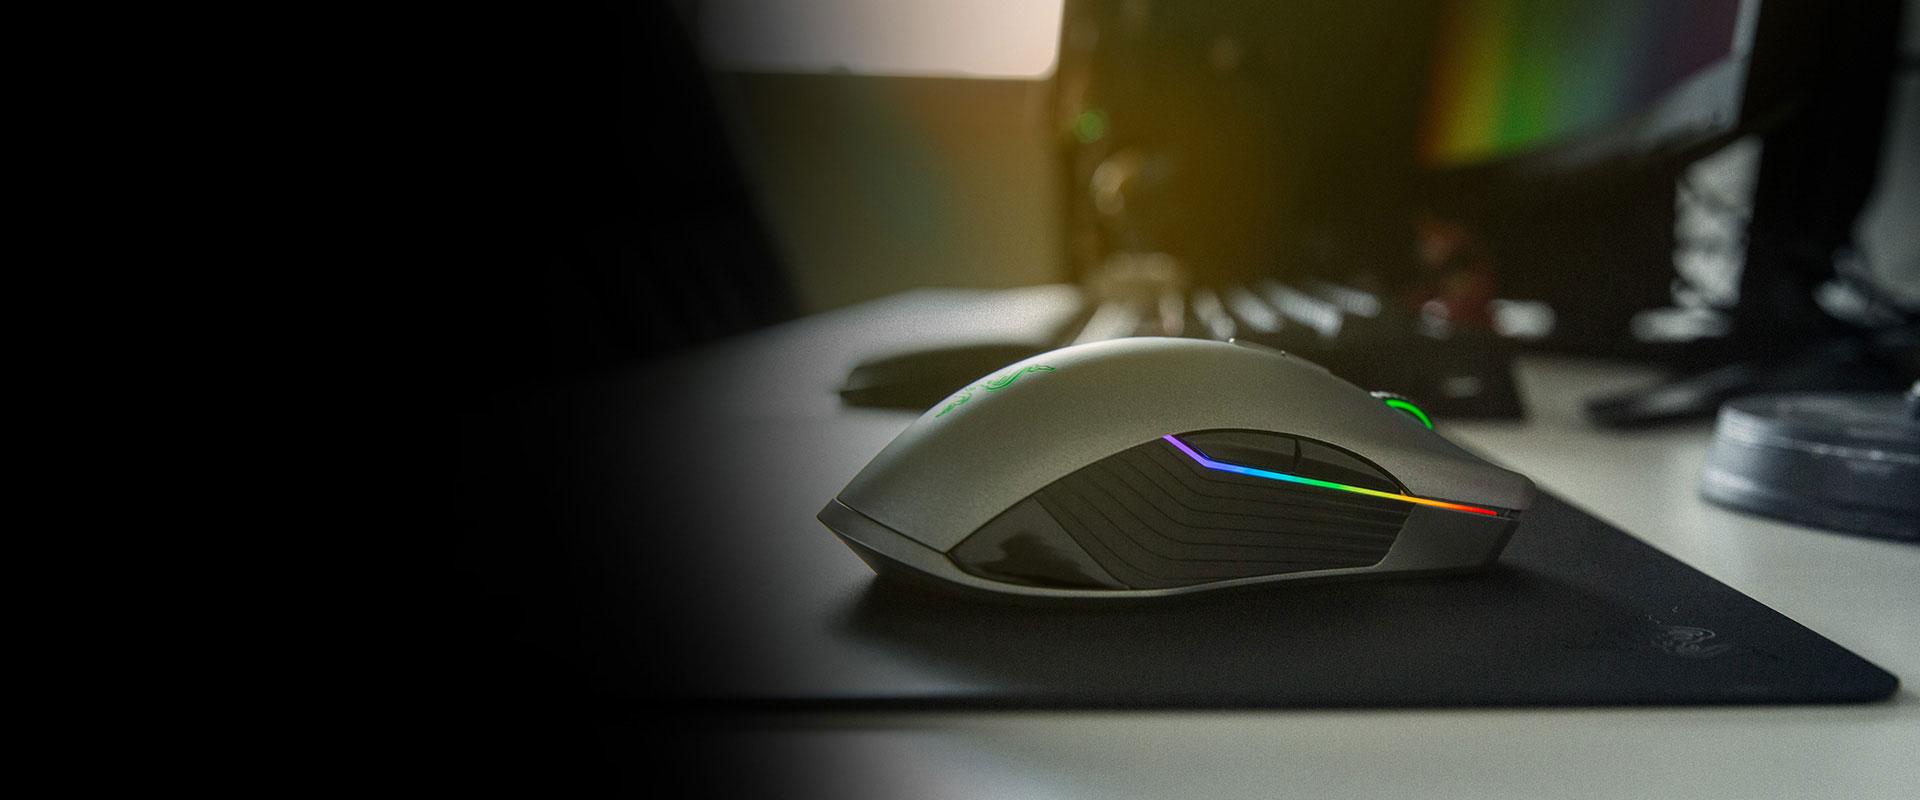 Chuột chơi game Razer Lancehead Wireless có thể tuỳ chỉnh thông qua phần mềm Razer Synapse 3